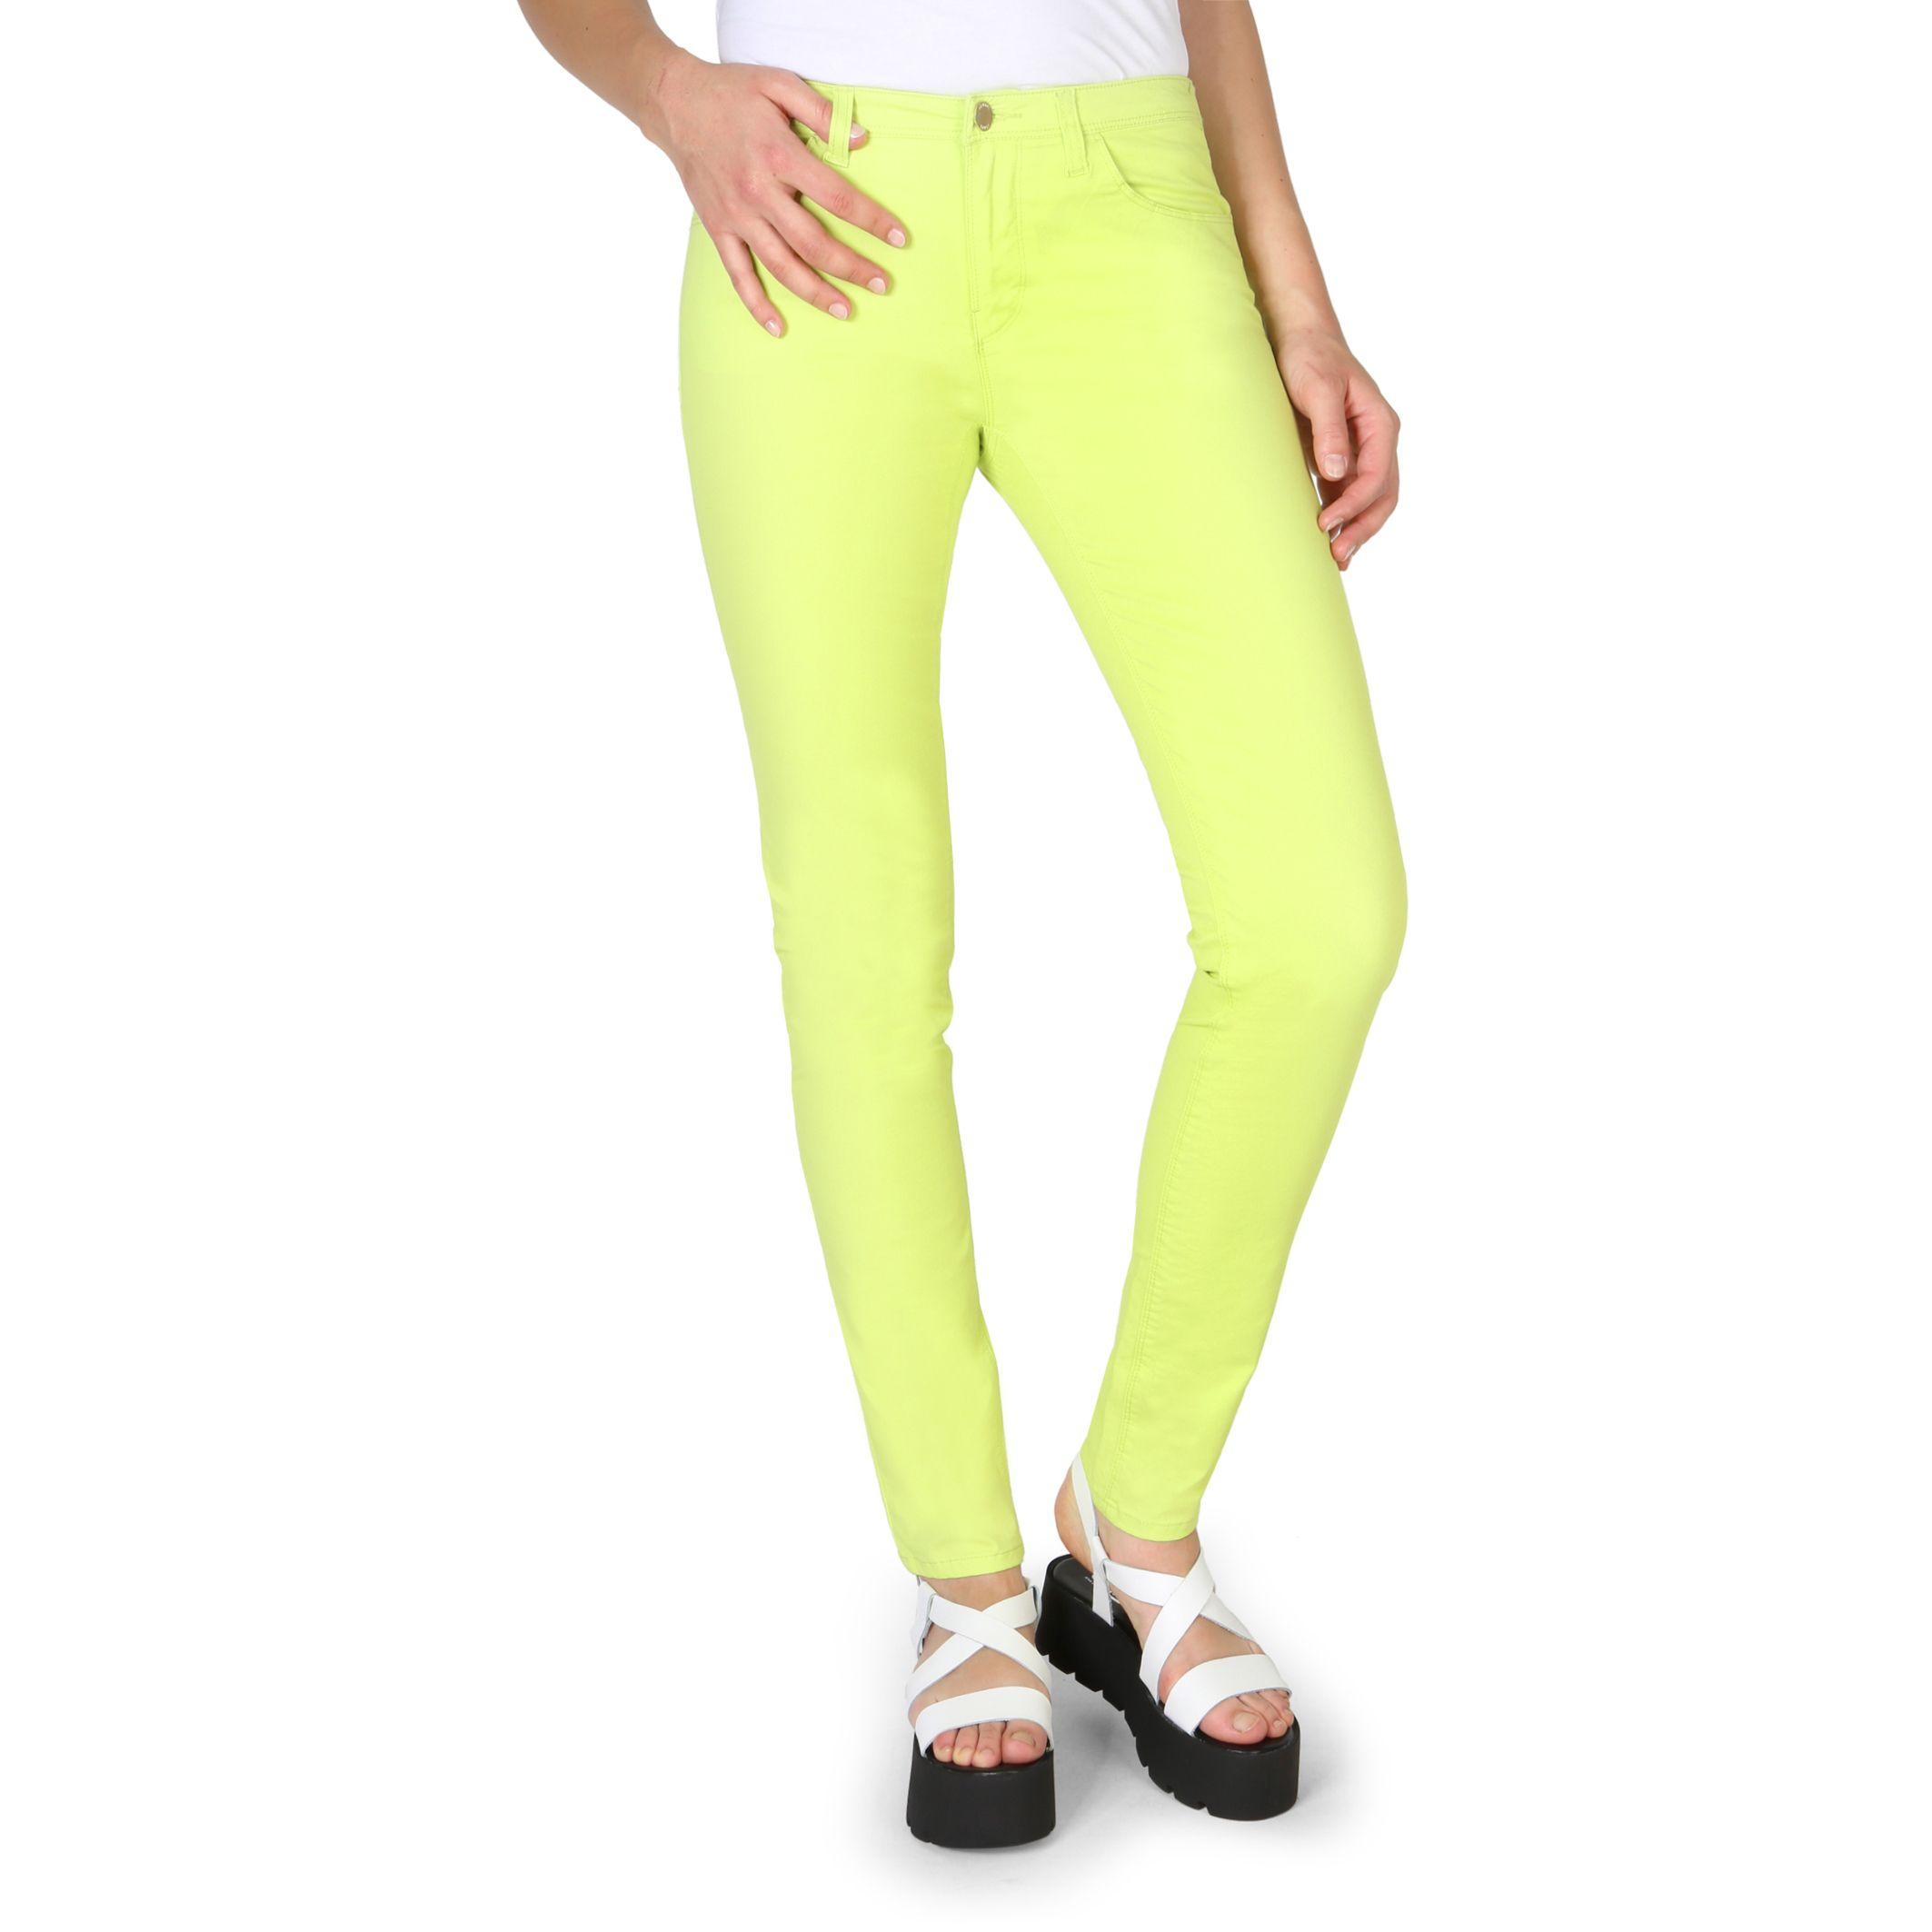 Pantaloni Armani Jeans3Y5J28_5NZXZ